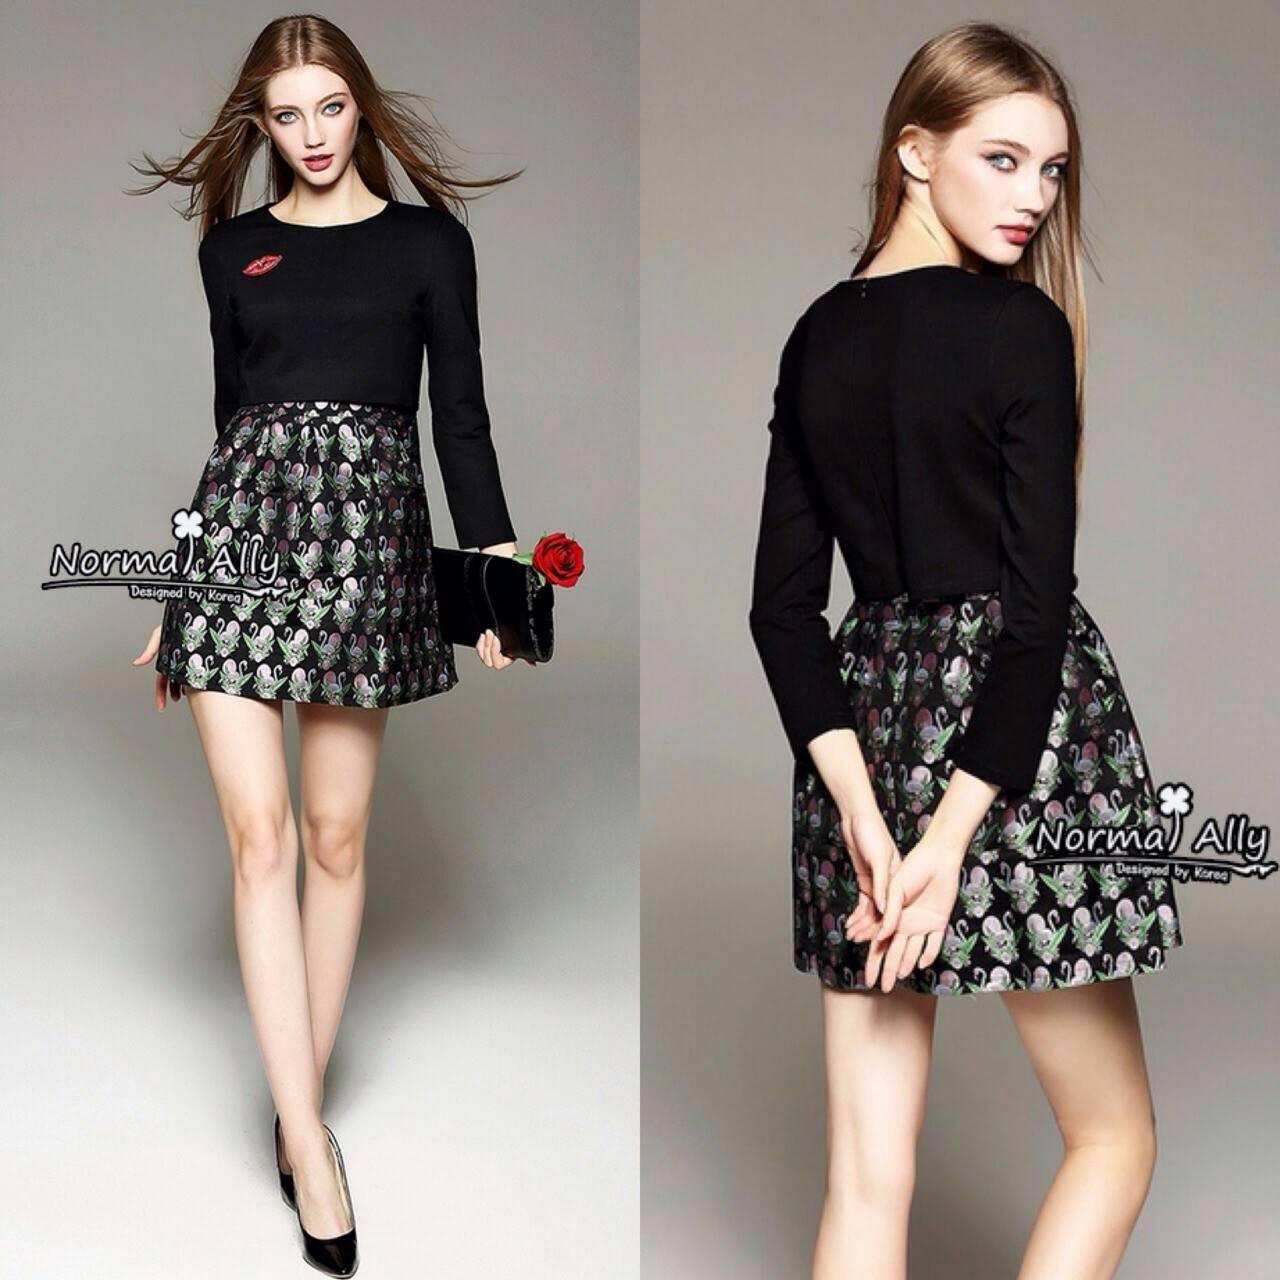 Normal Ally Present Fendi Autumn Collection SS Dress เดรสสีดำ